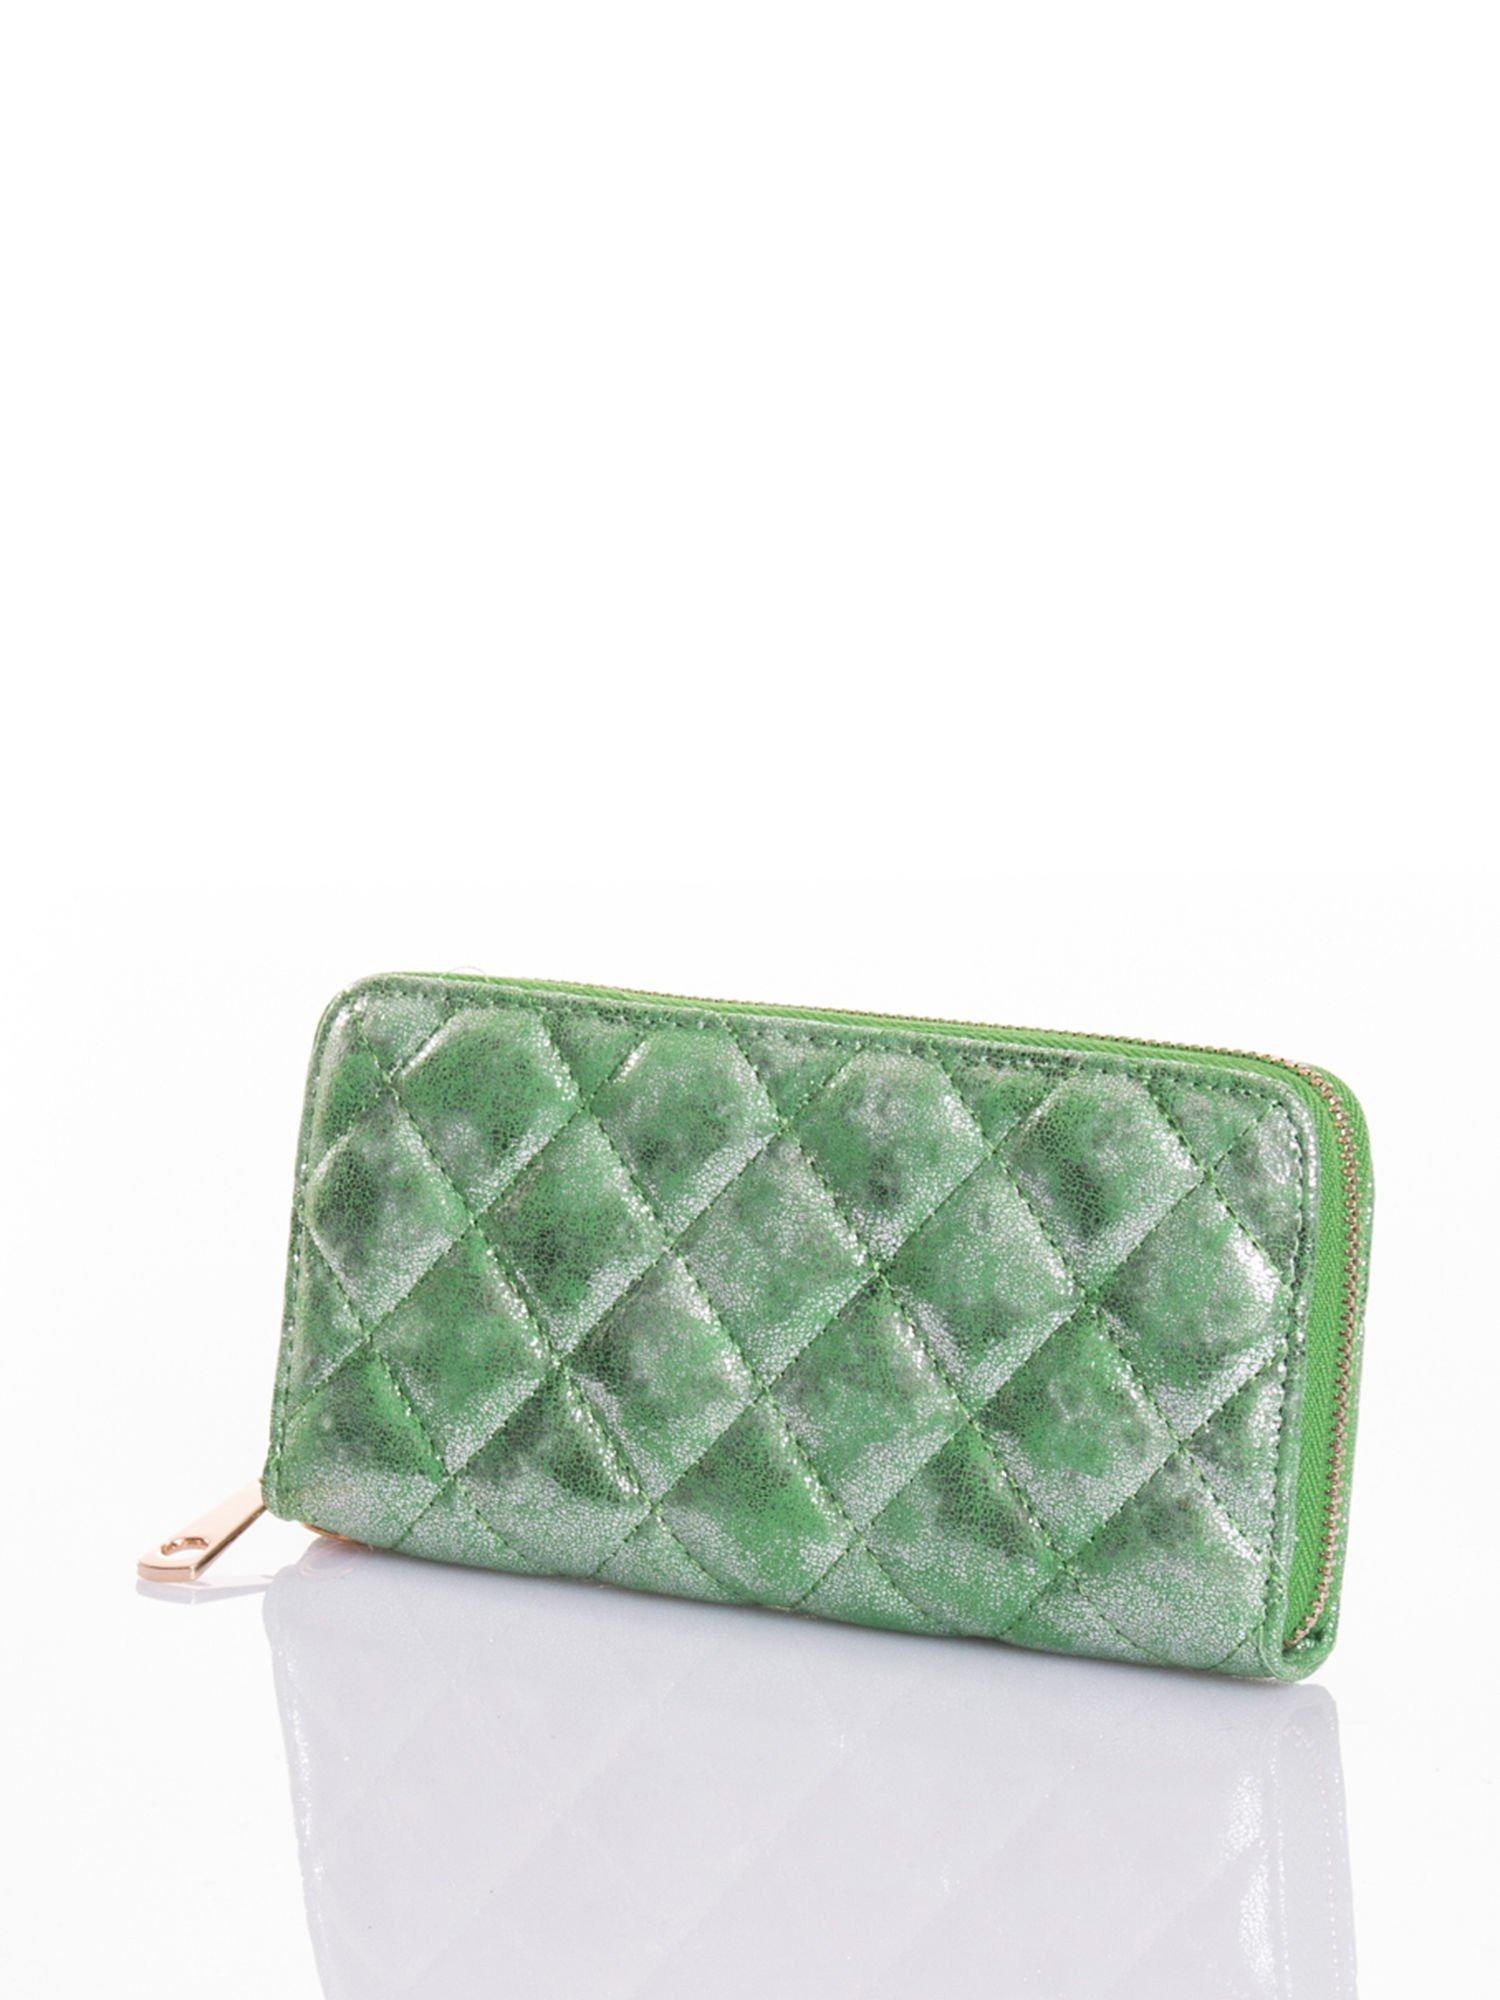 Zielony pikowany portfel                                  zdj.                                  2